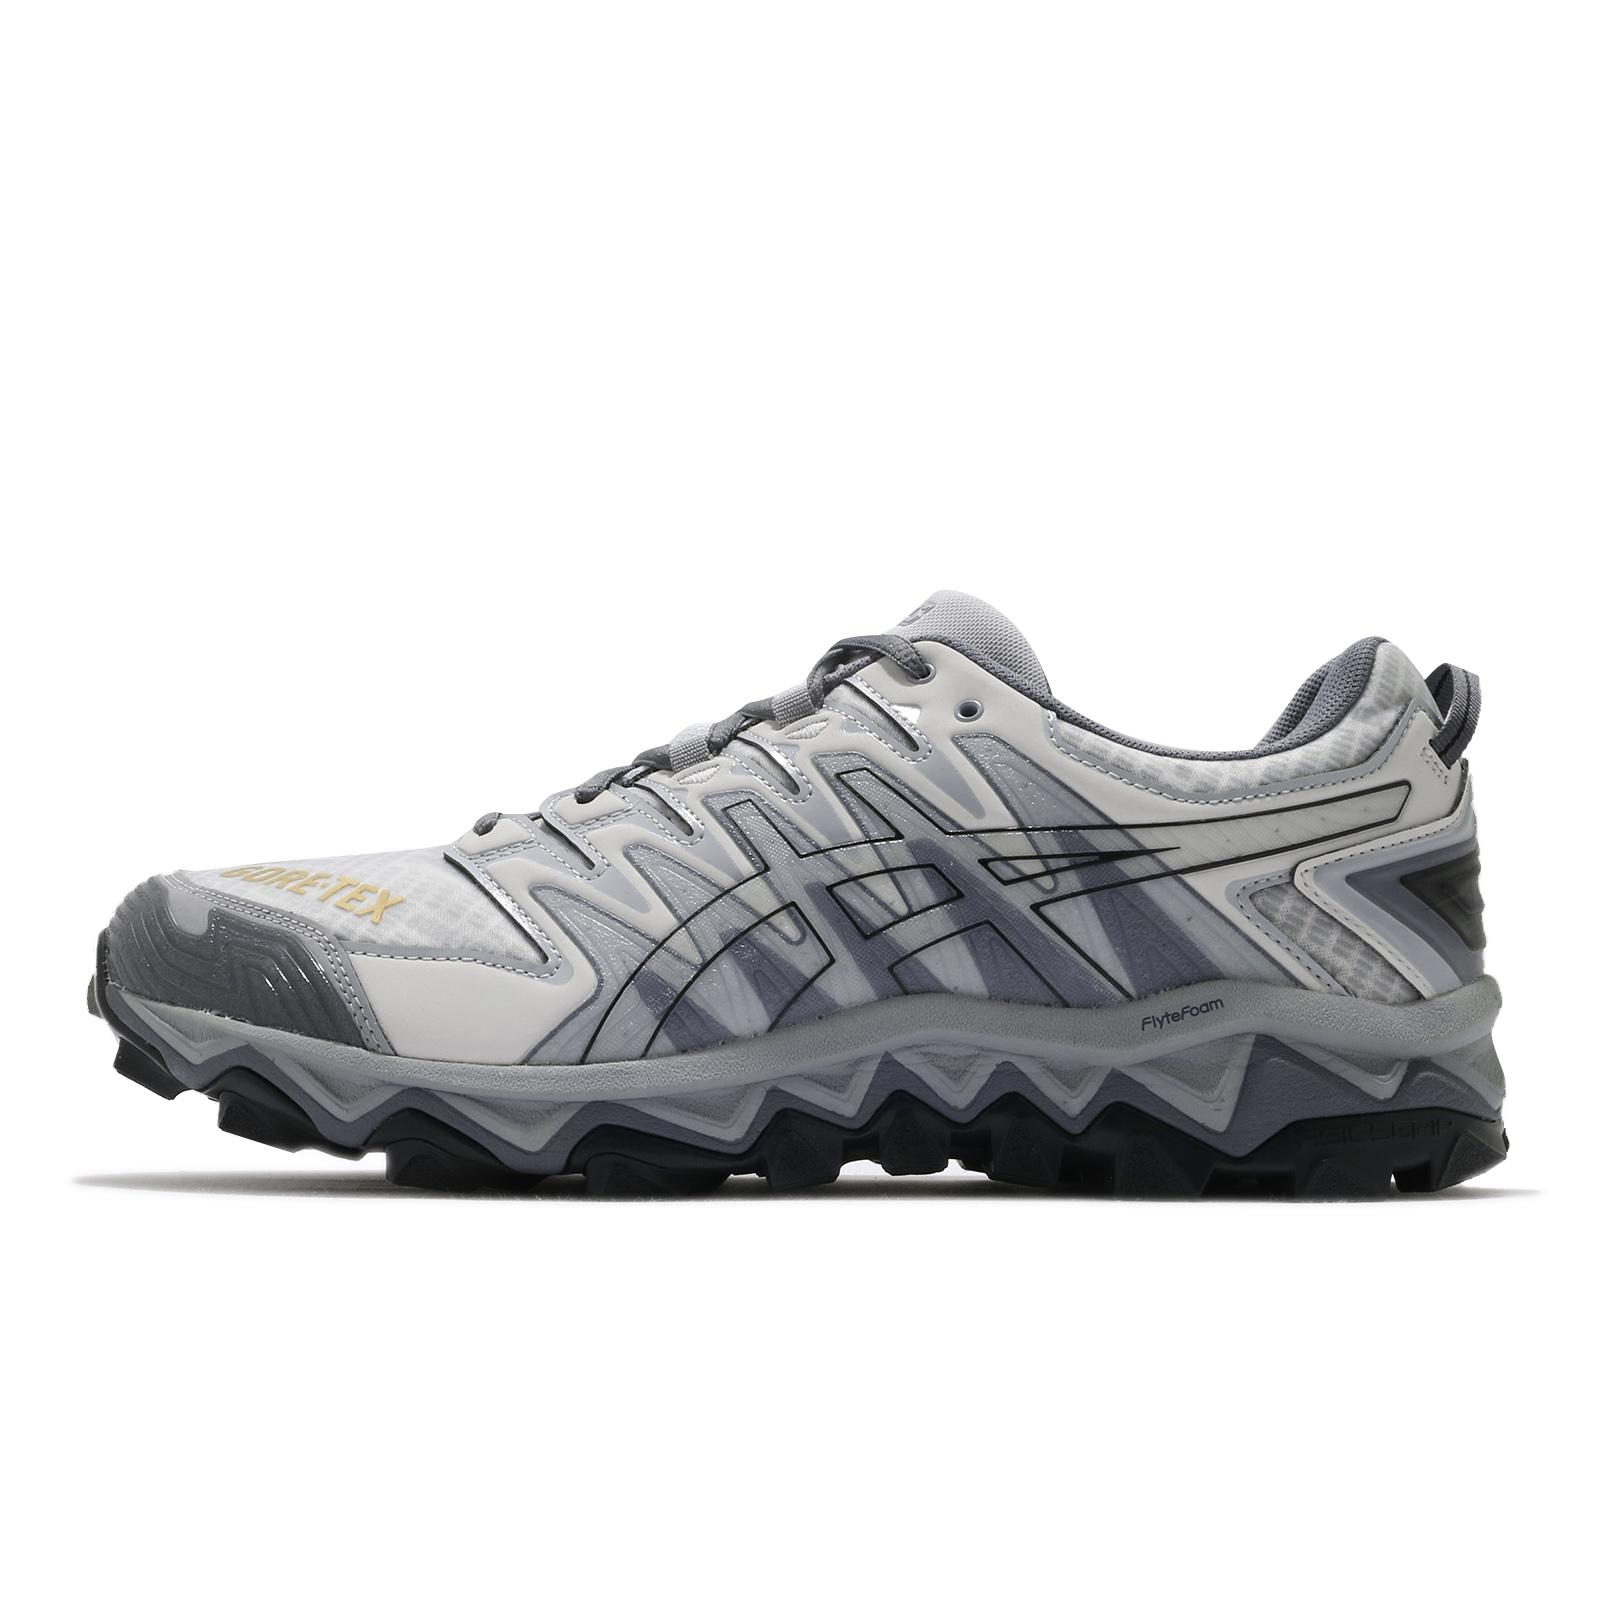 Asics Beams x Gel FujiTrabuco 7 G-TX SPS 灰 防水 越野跑鞋 聯名 男鞋 ACS